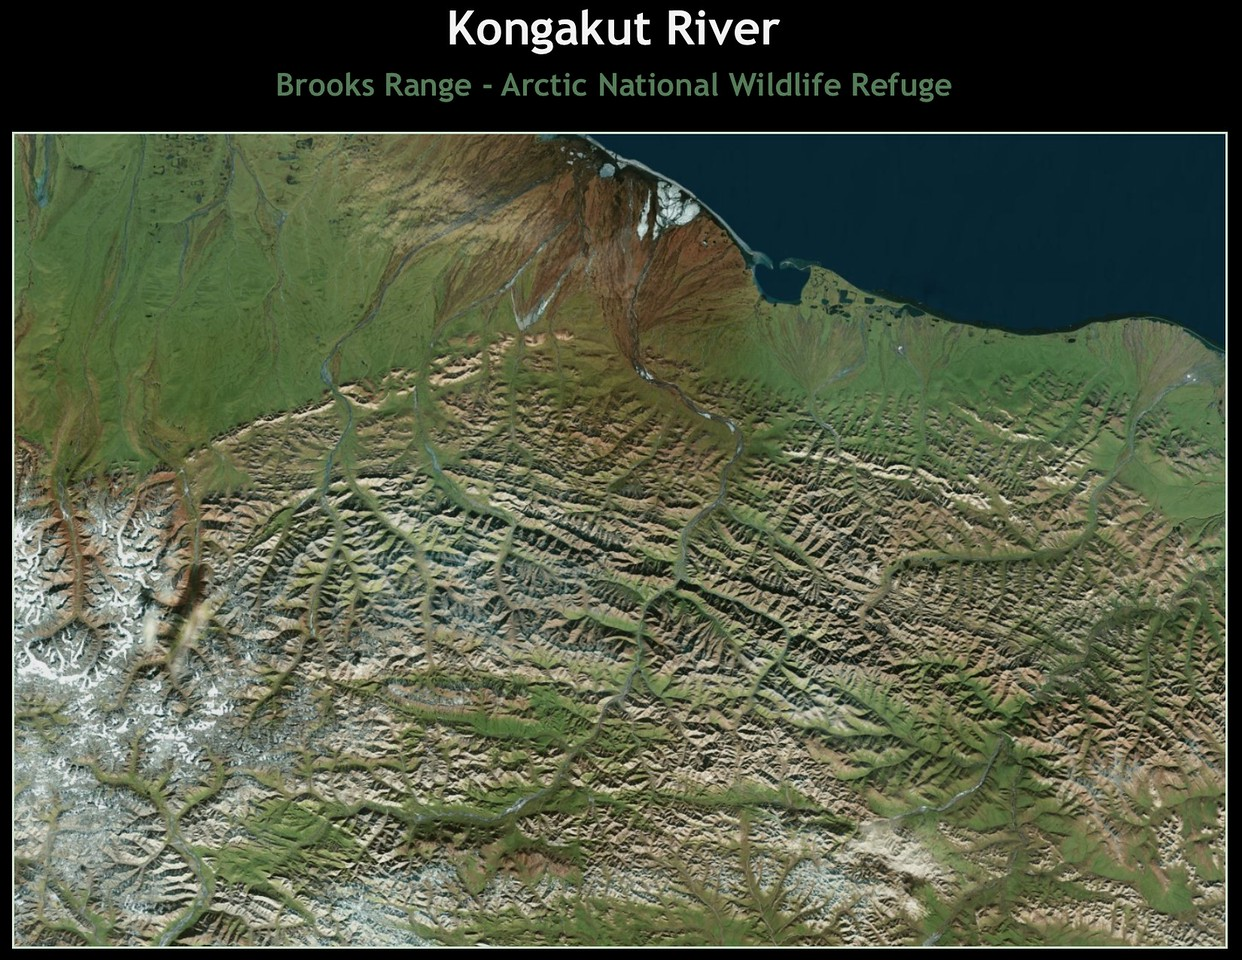 Kongakut River - Arctic National Wildlife Refuge